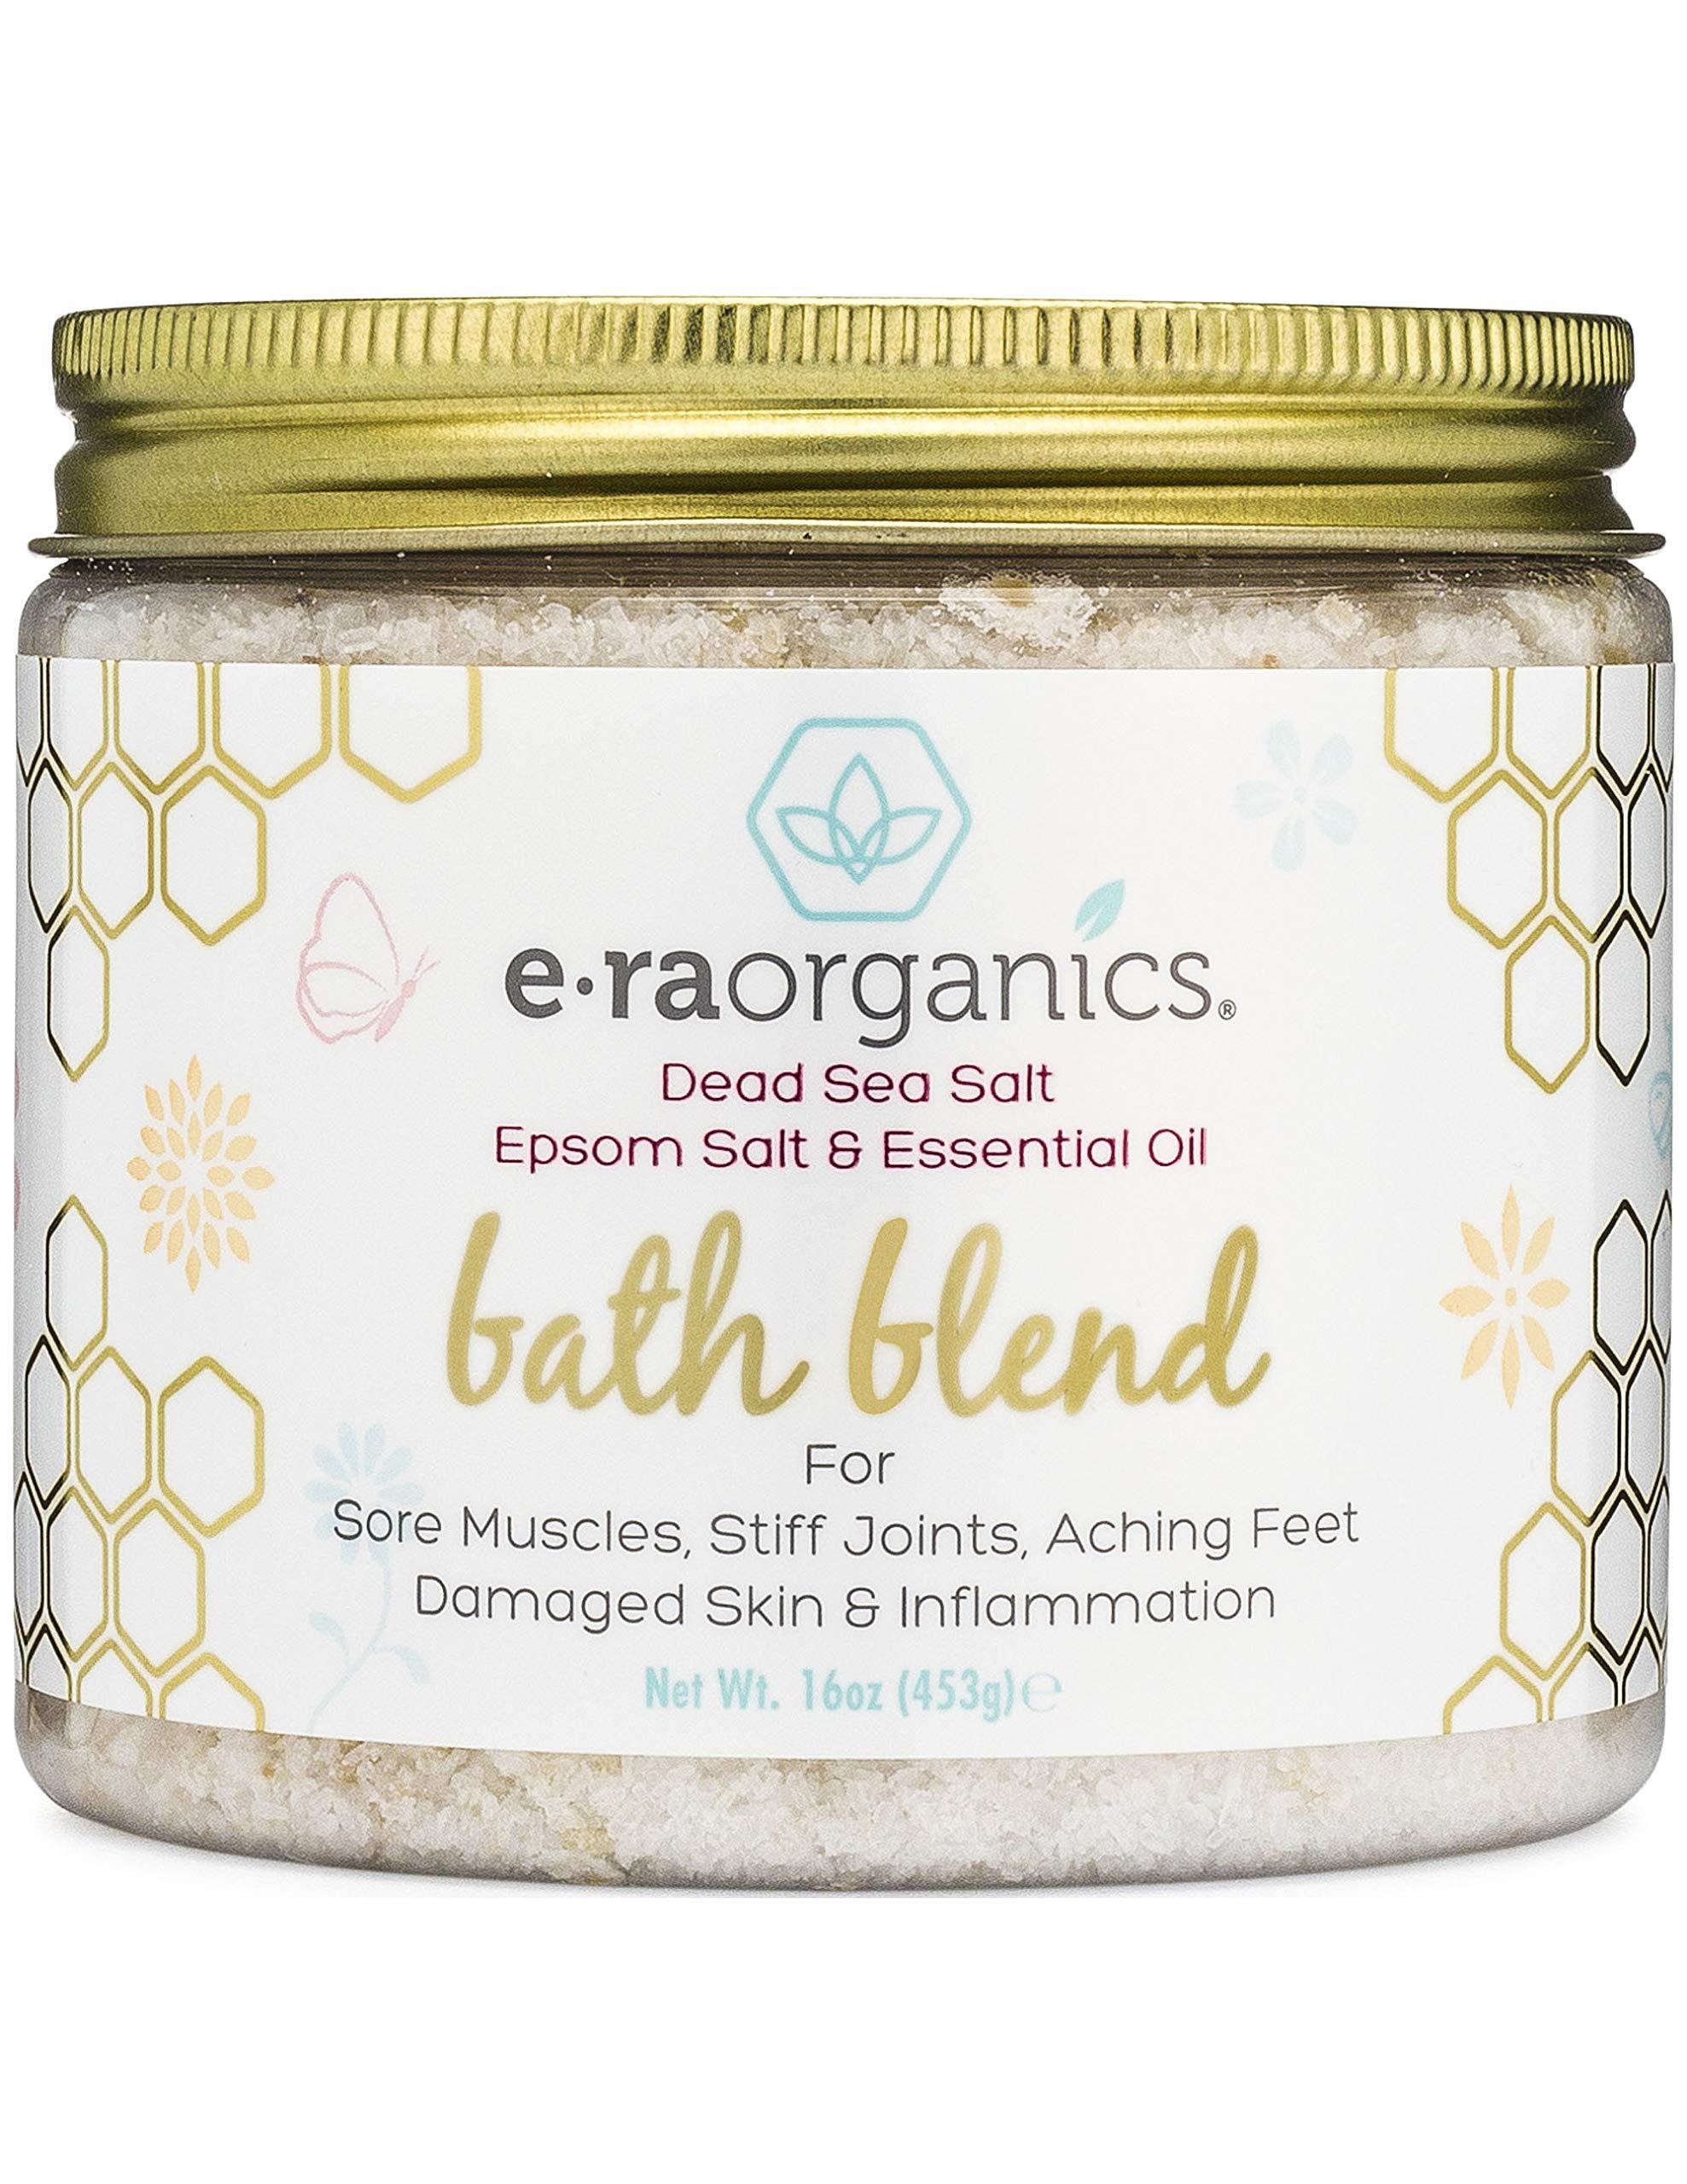 Relaxing Bath Salts & Essential Oils – Extra Soothing Spa Quality Epsom Salt, Dead Sea Salt & Essential Oil Blend For Sore Muscles, Swollen Feet, Sitz Bath for Hemorrhoids & More.